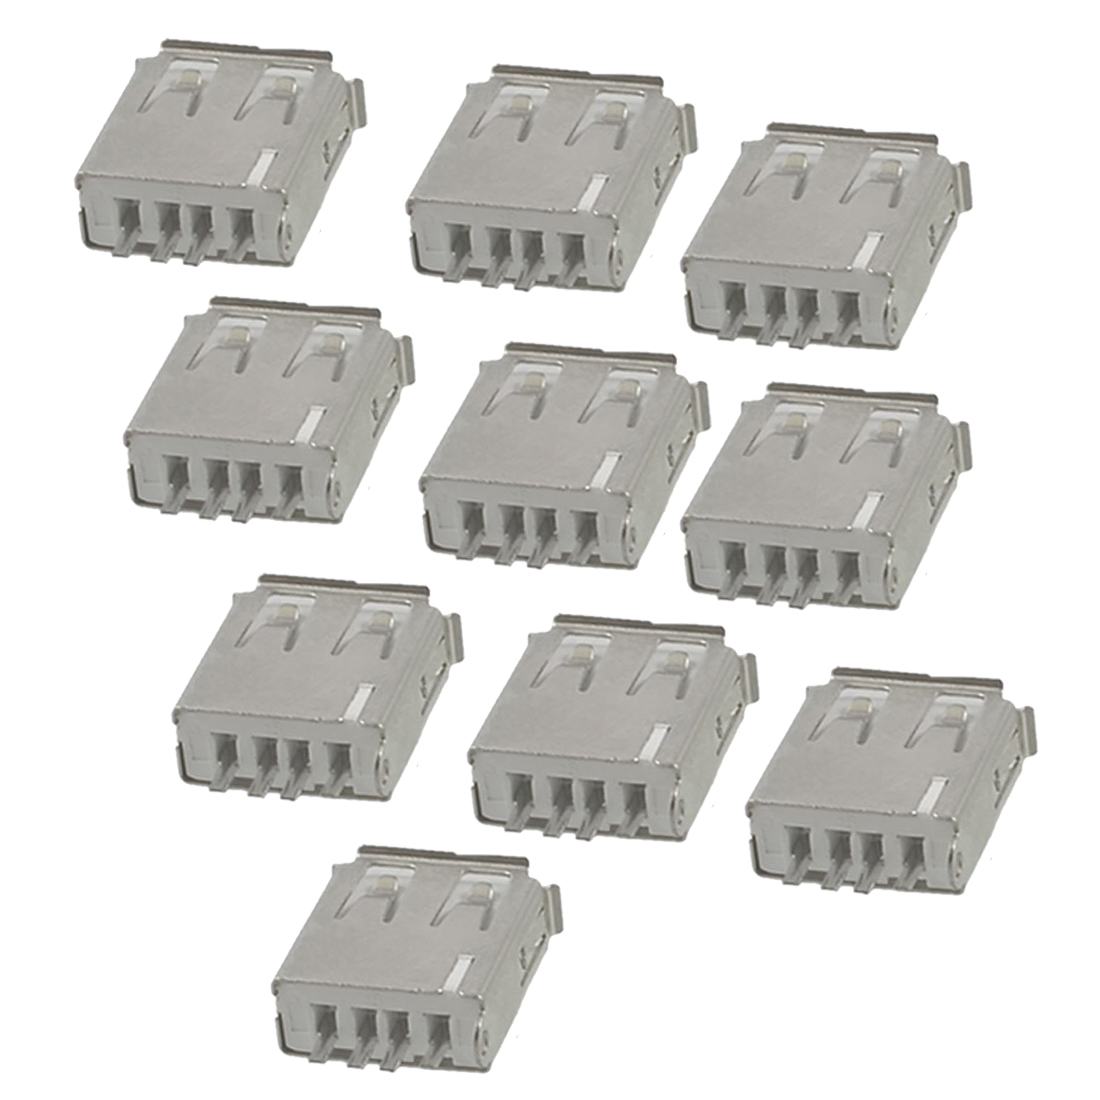 FS Hot 10 Pcs Straight Solder Type USB A Female Plug Jack Connector<br><br>Aliexpress